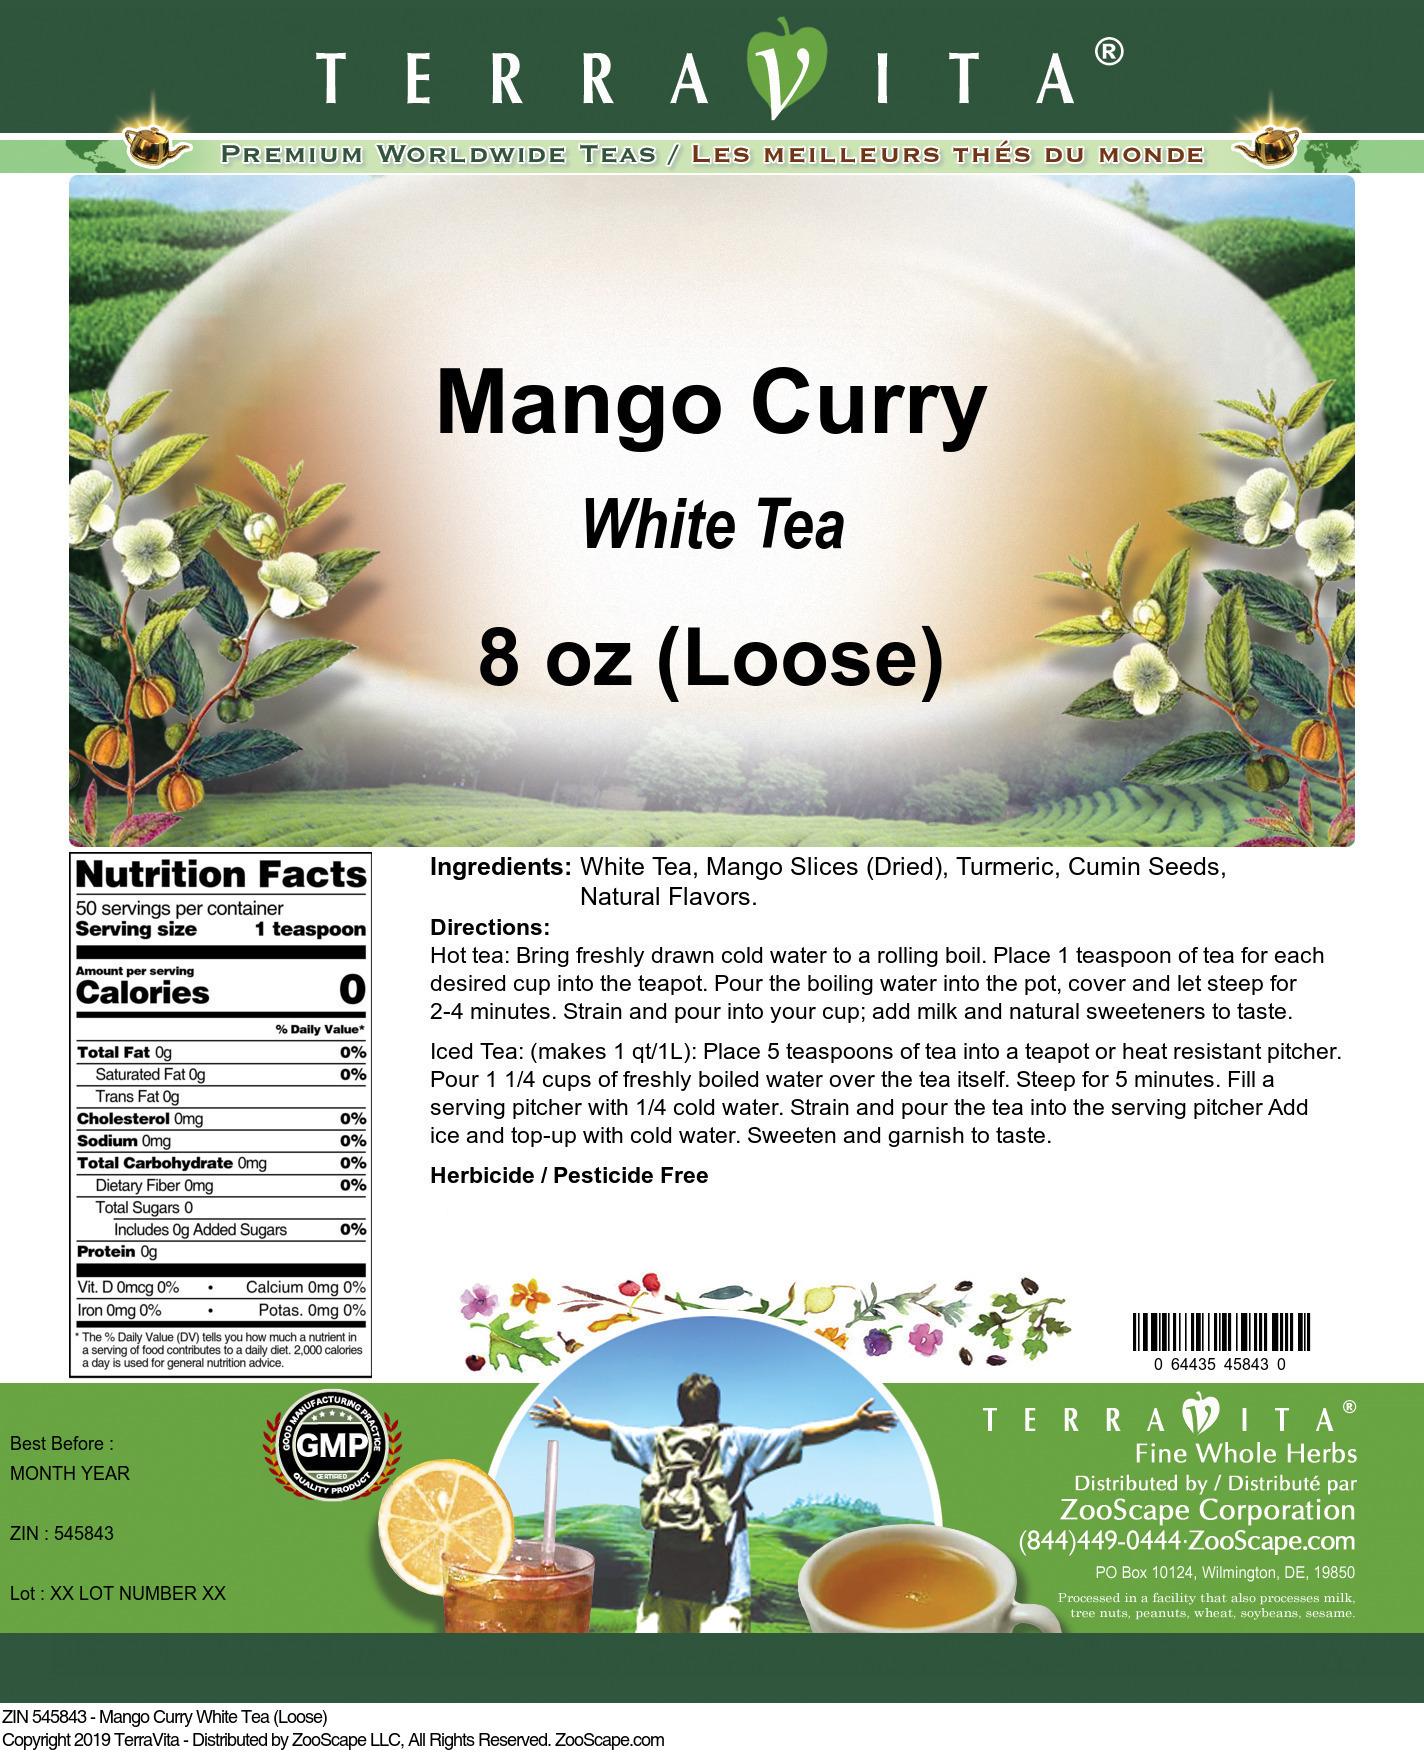 Mango Curry White Tea (Loose)